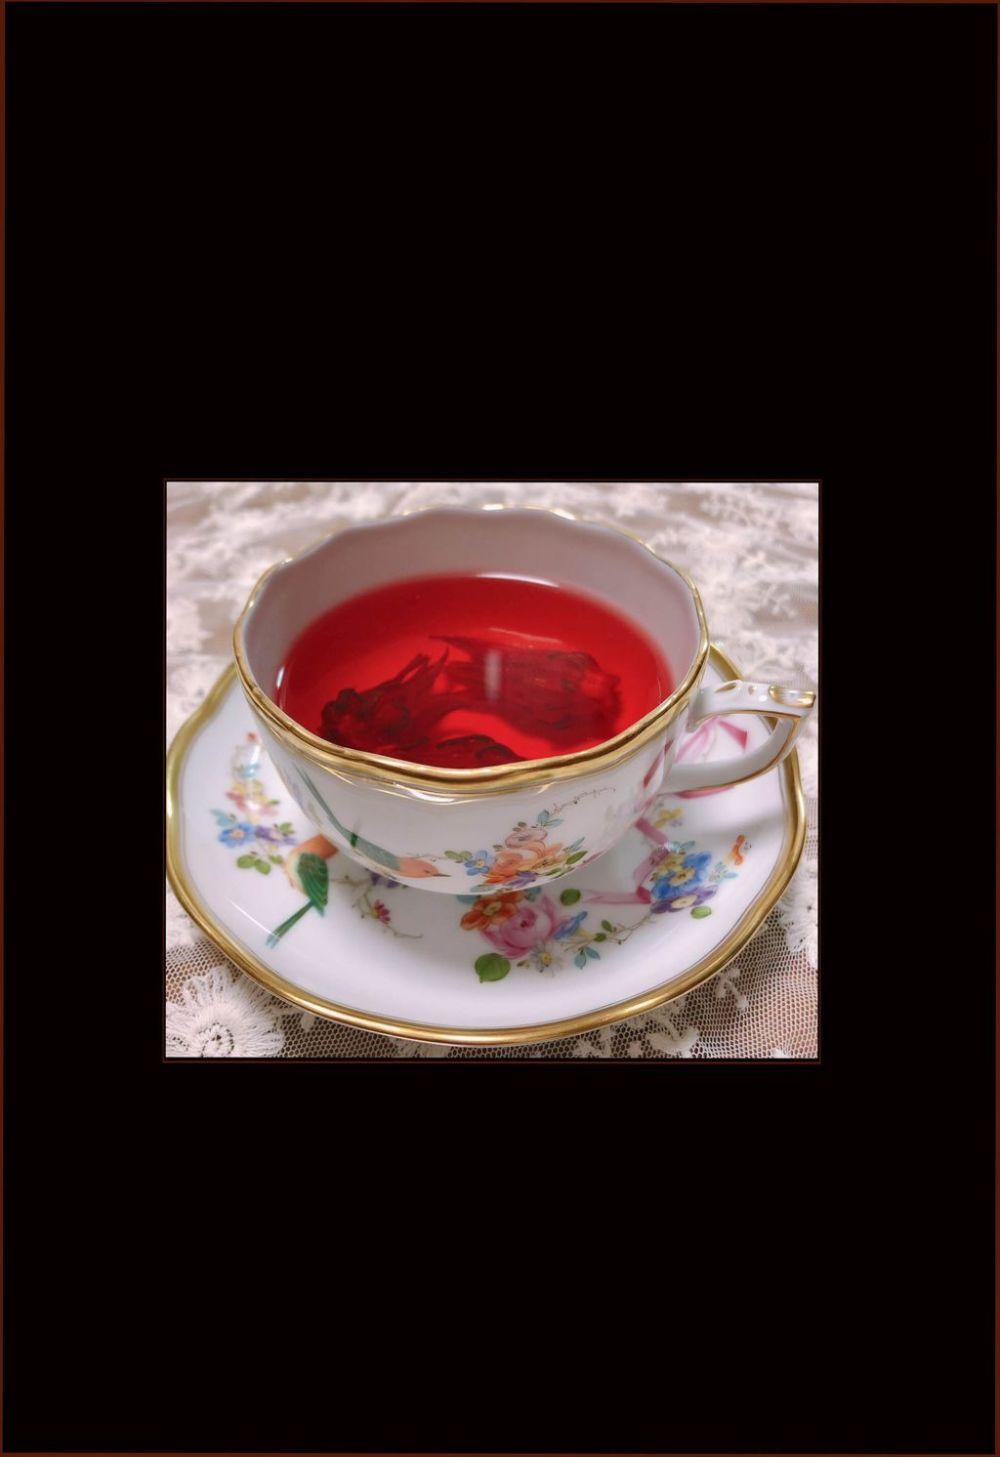 Agua de Jamaica - Hibiscus Tea